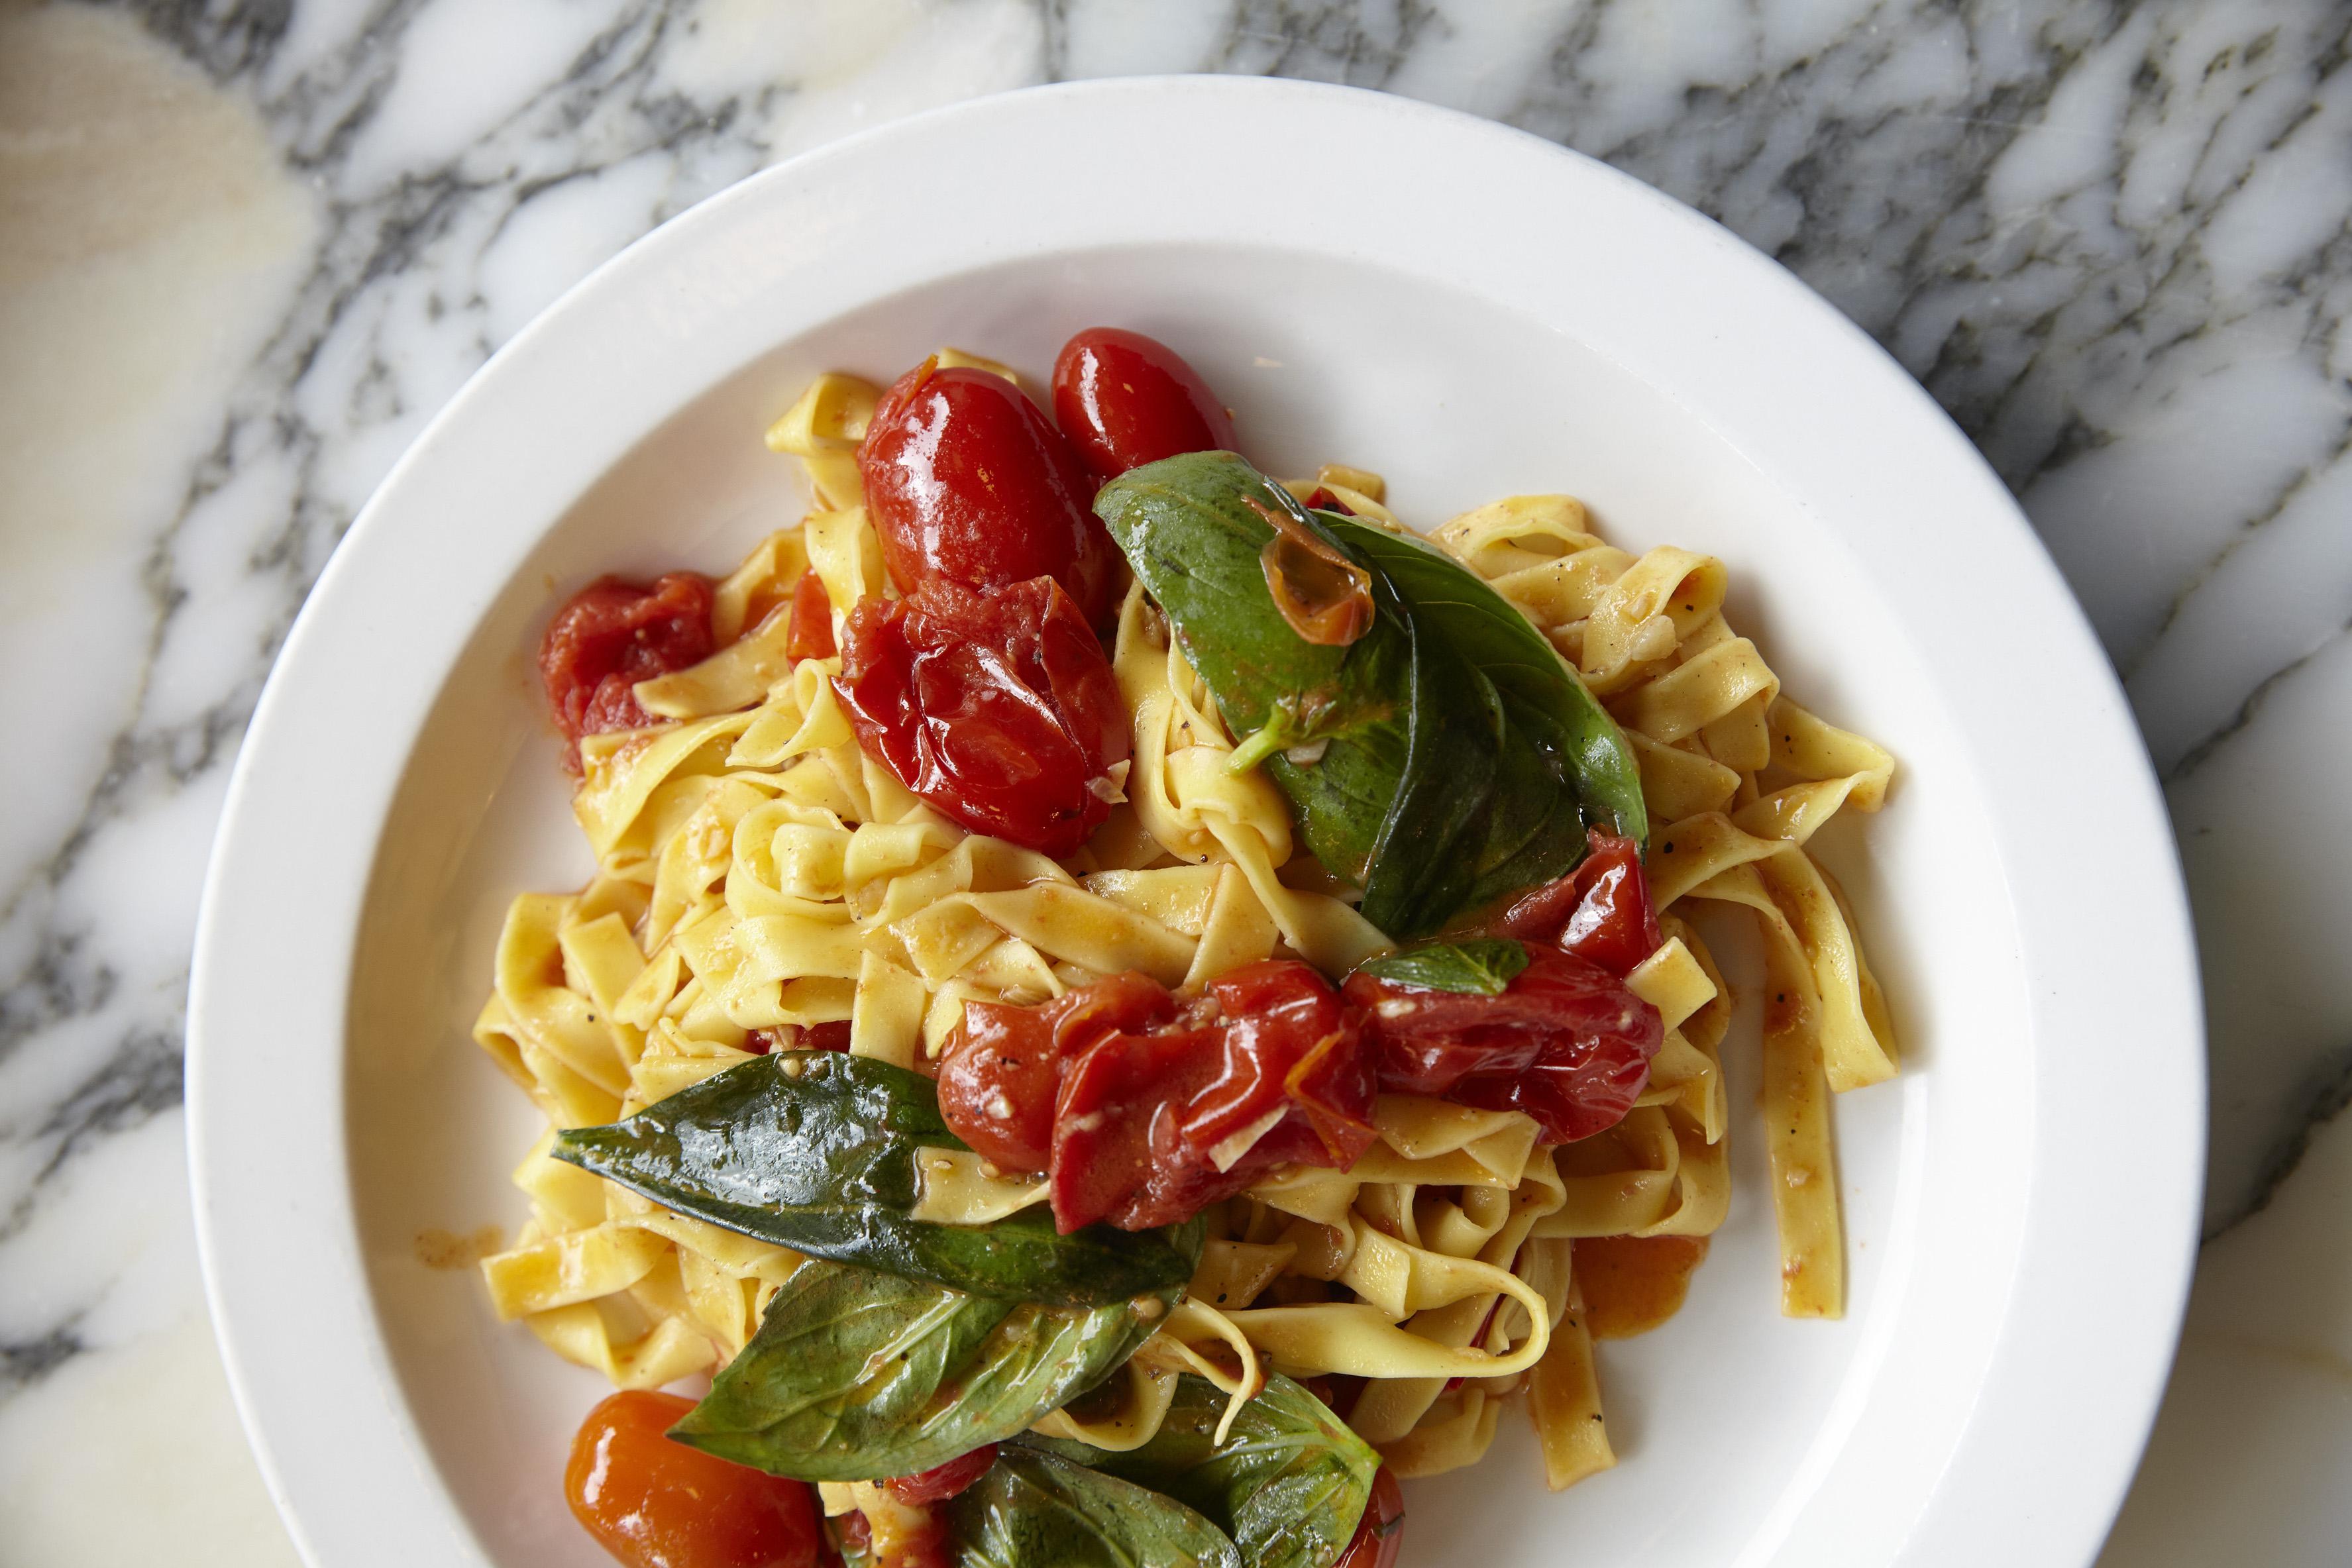 Tomato and basil pasta at Padella, in London Bridge. The restaurant run by Tim Siadatan will open on Phipp Street in Shoreditch